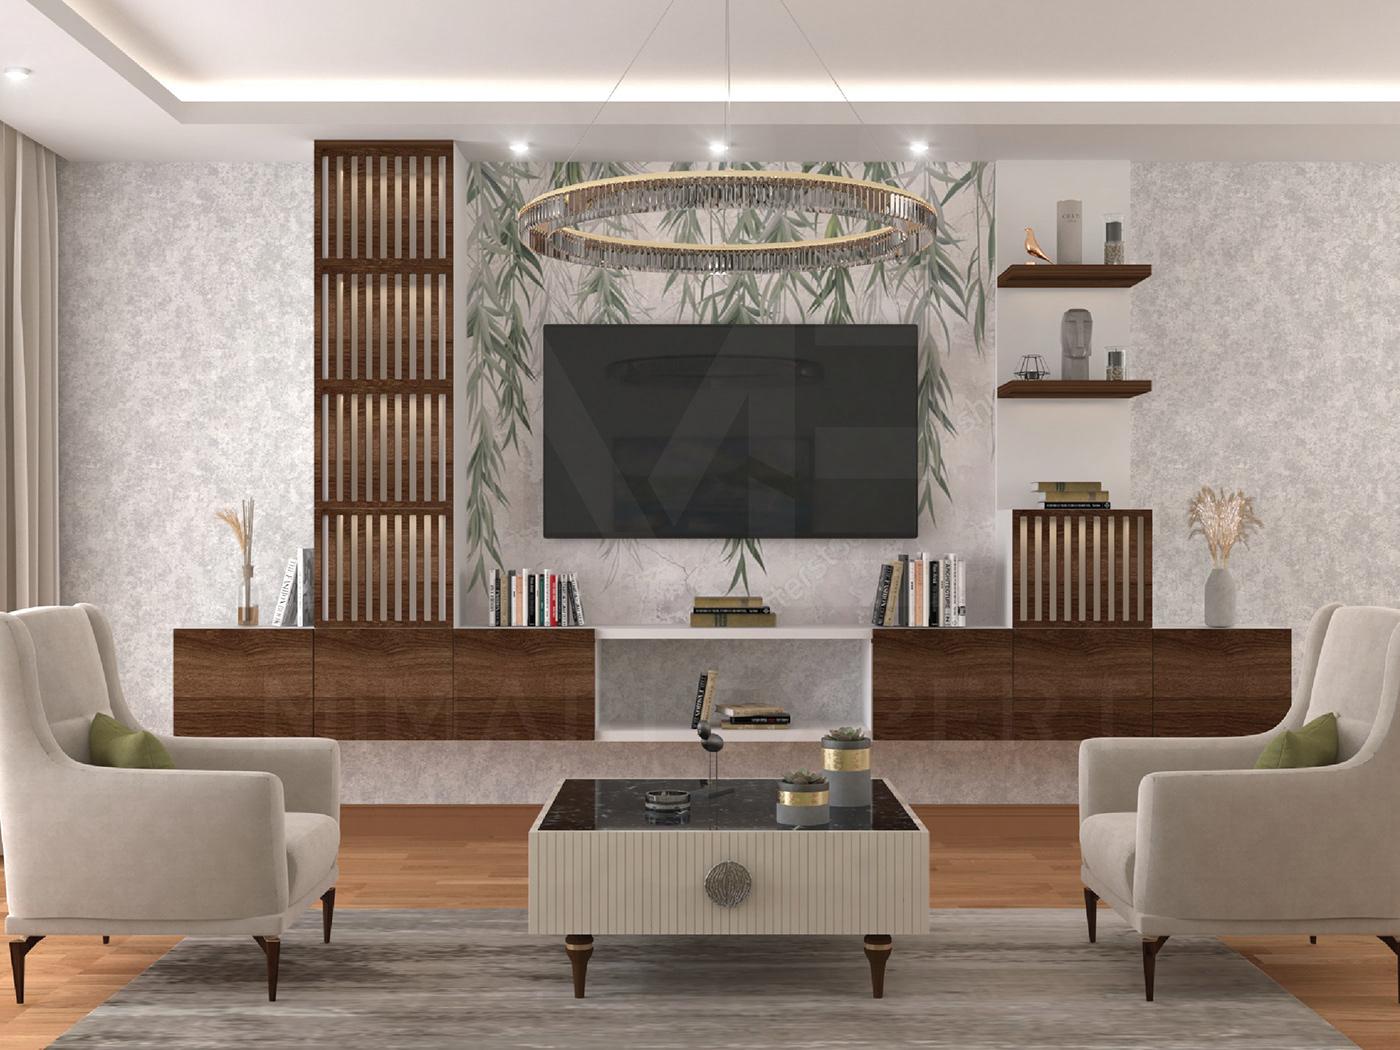 3D architecture decor decoration furniture home house Interior interior design  Render